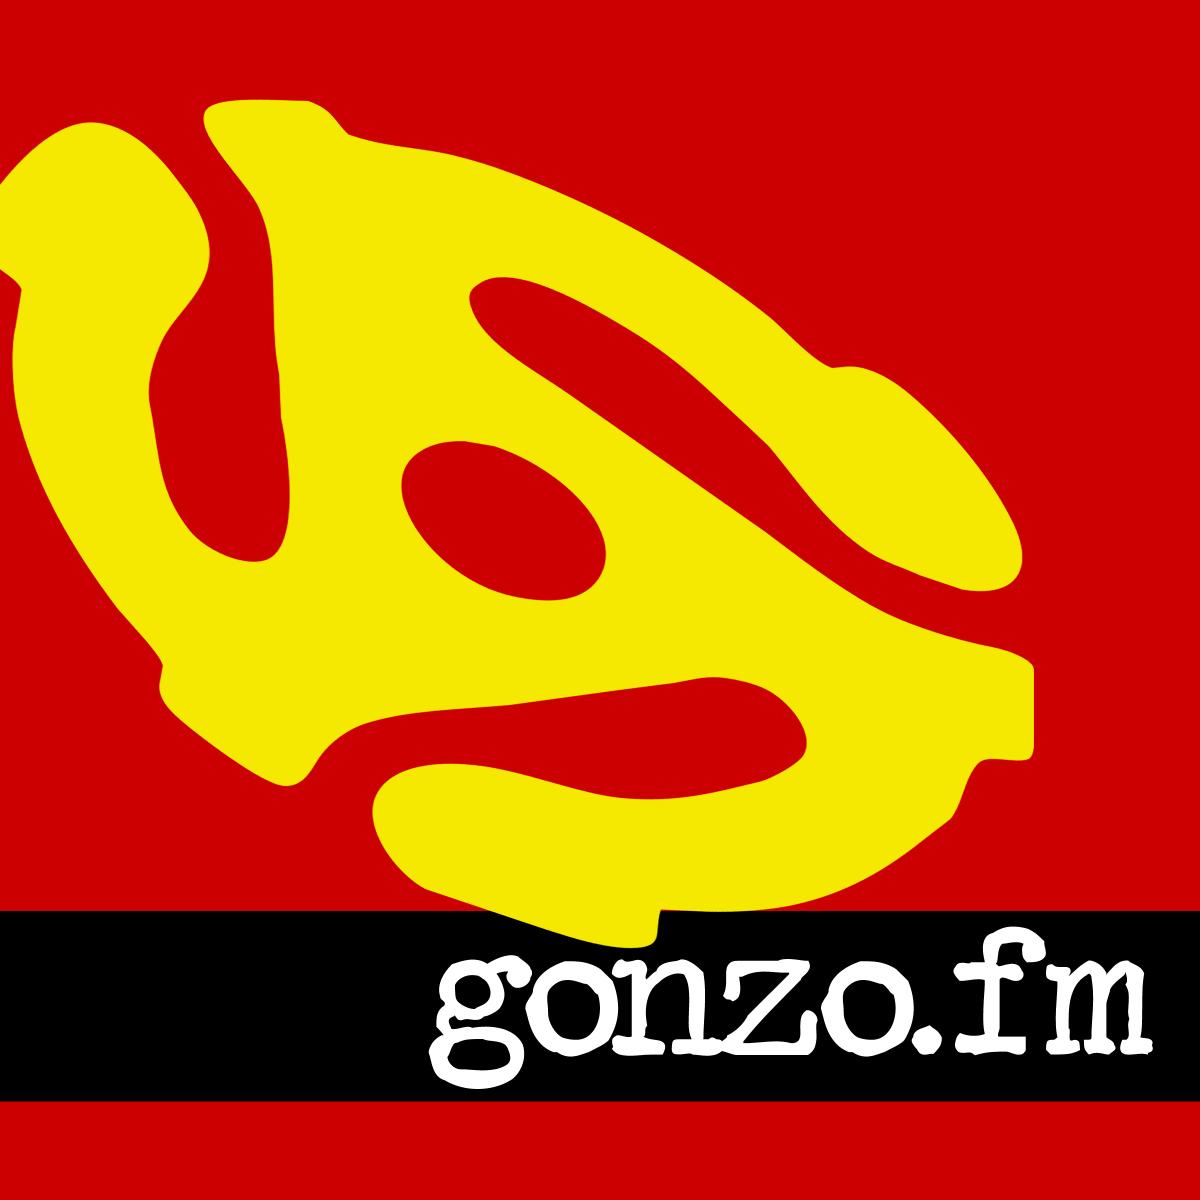 Gonzo Greg